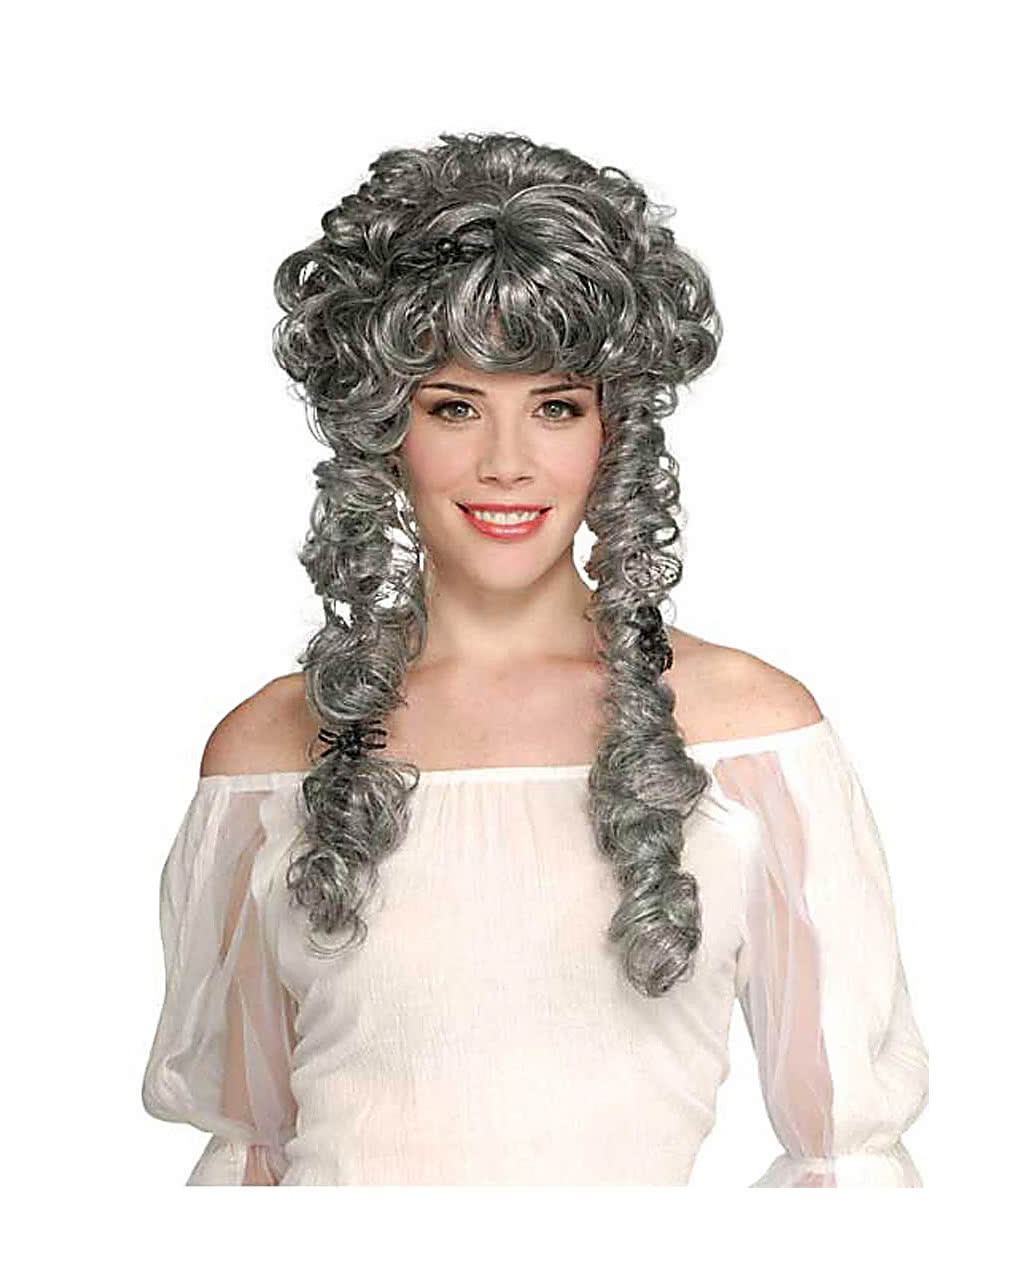 Death Princess Curly Wig Gray Baroque Wig For Halloween